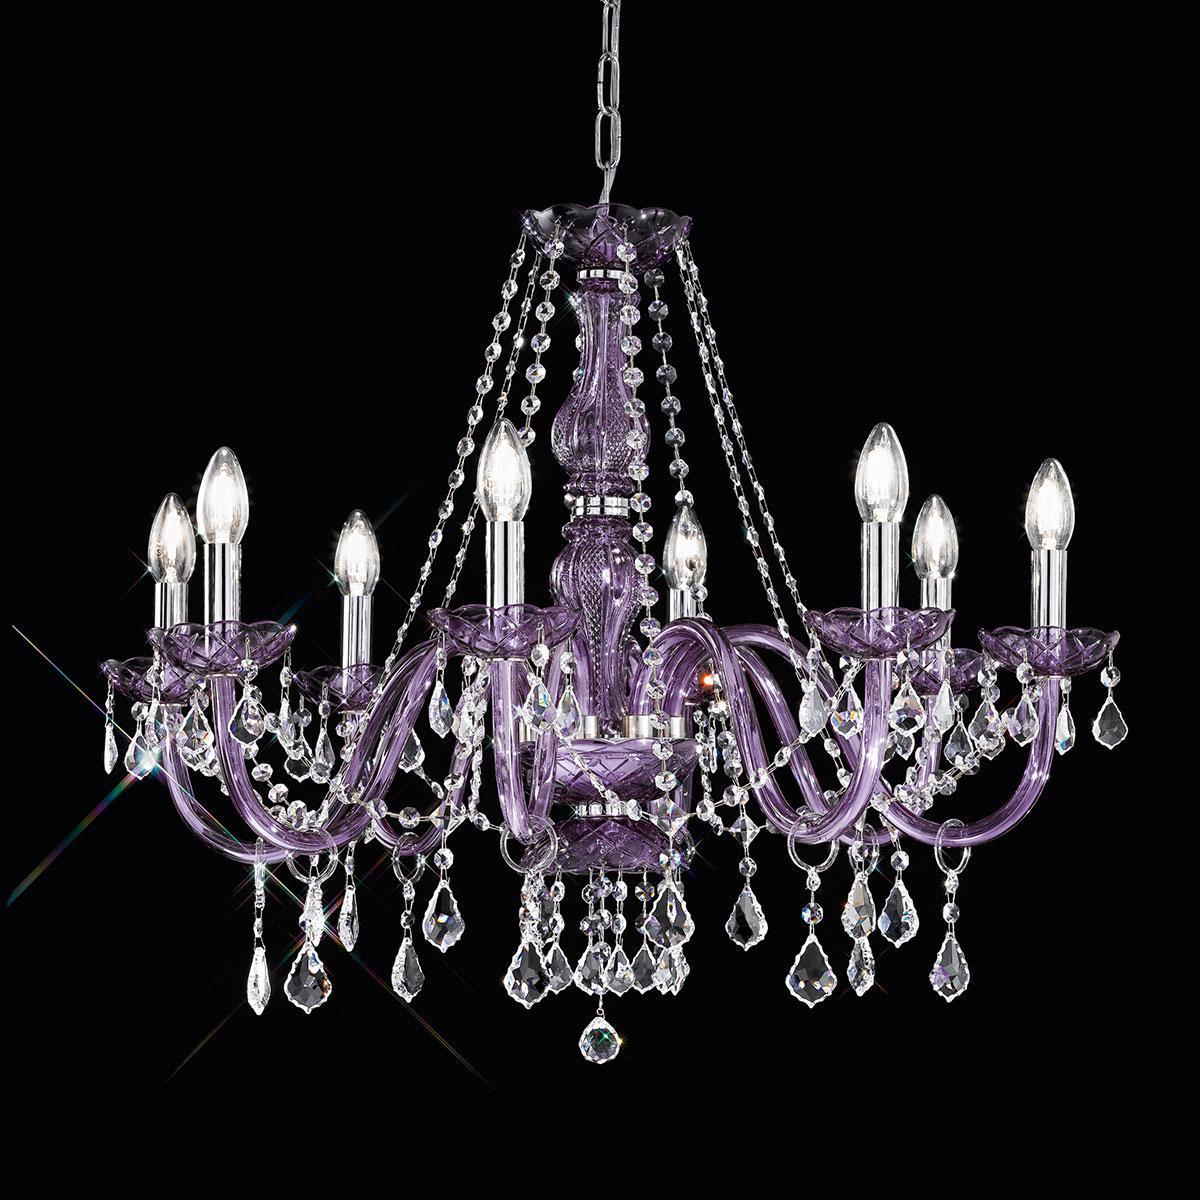 Brindisi venetian crystal chandelier murano glass chandeliers brindisi venetian crystal chandelier 8 light purple mozeypictures Image collections